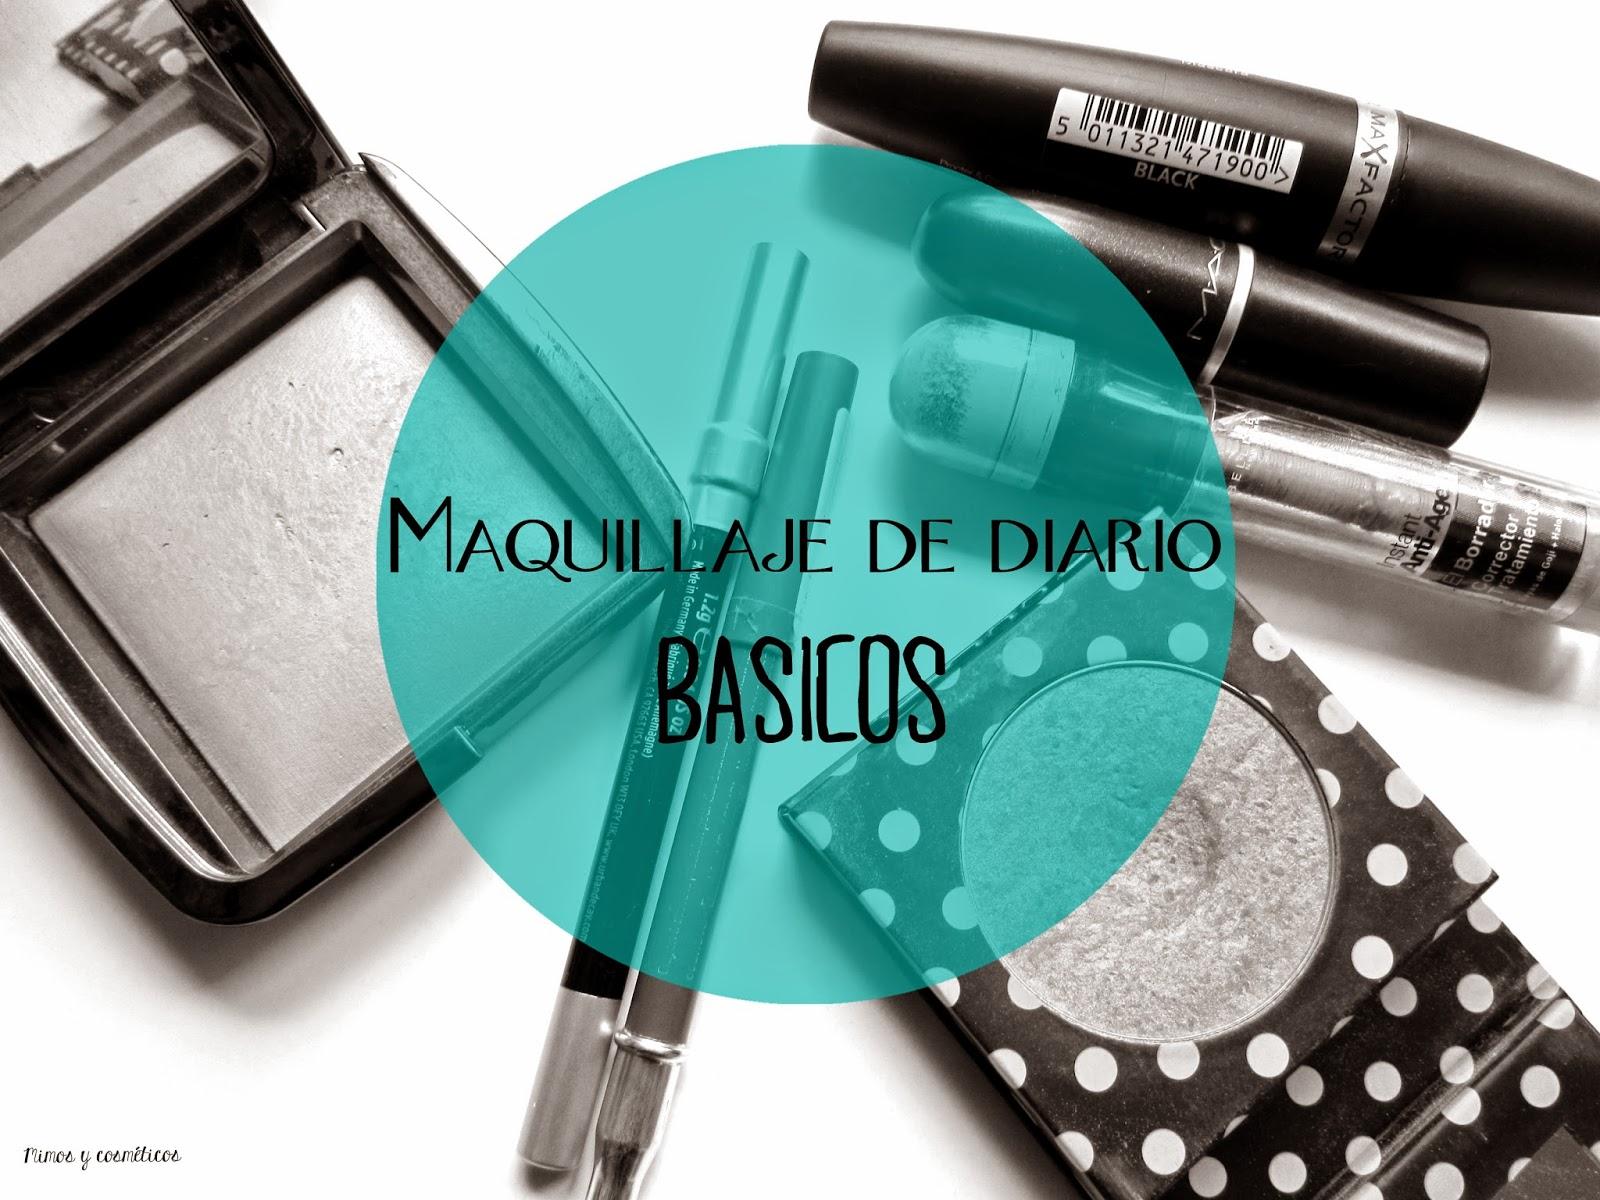 Maquillaje de diario. Vol. II